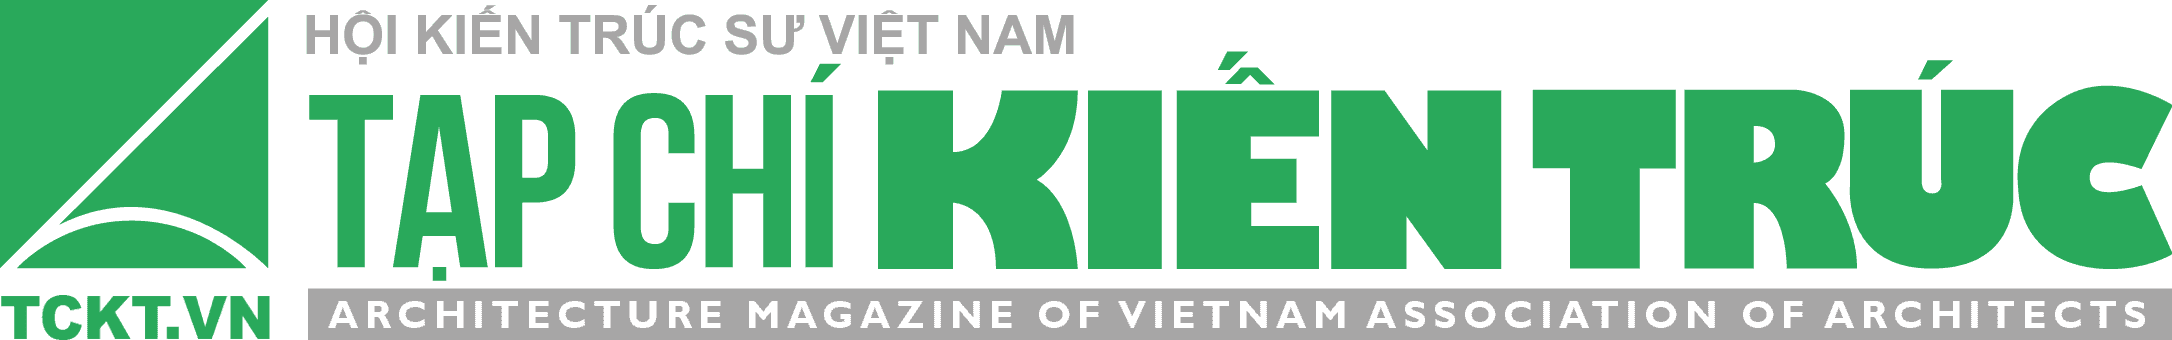 Logo Tạp chí Kiến trúc